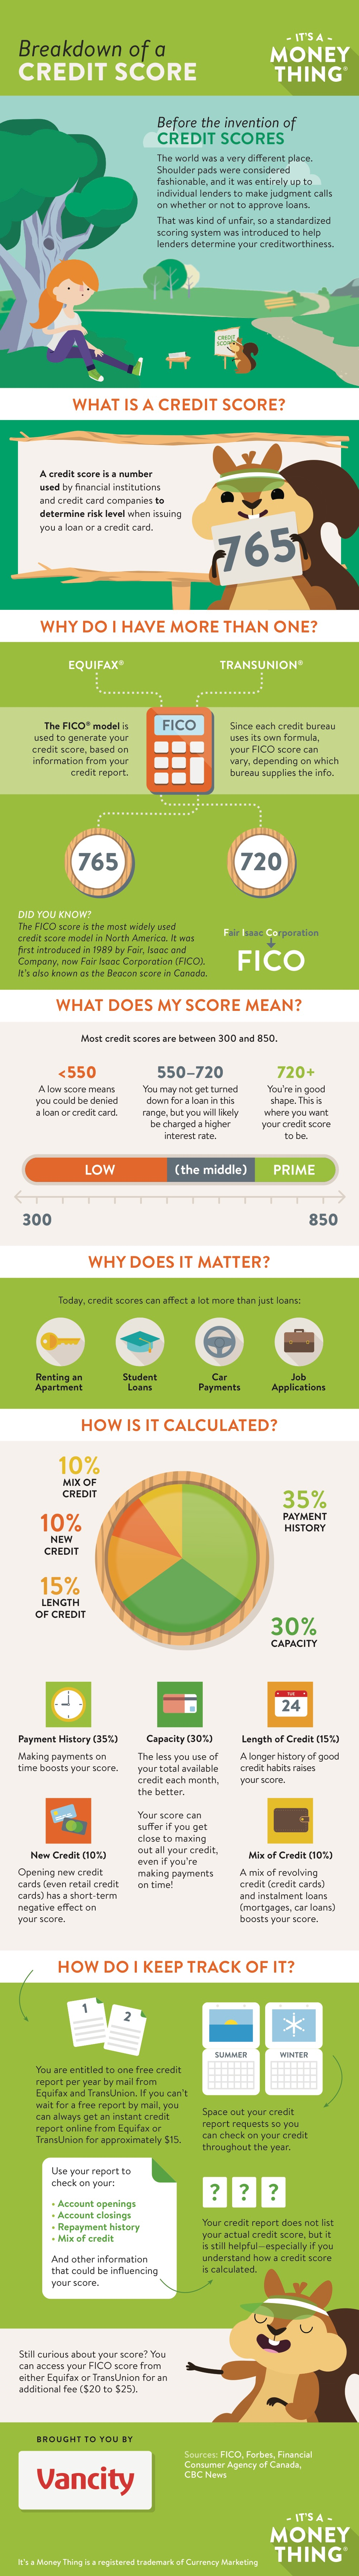 Infographic: Credit score breakdown